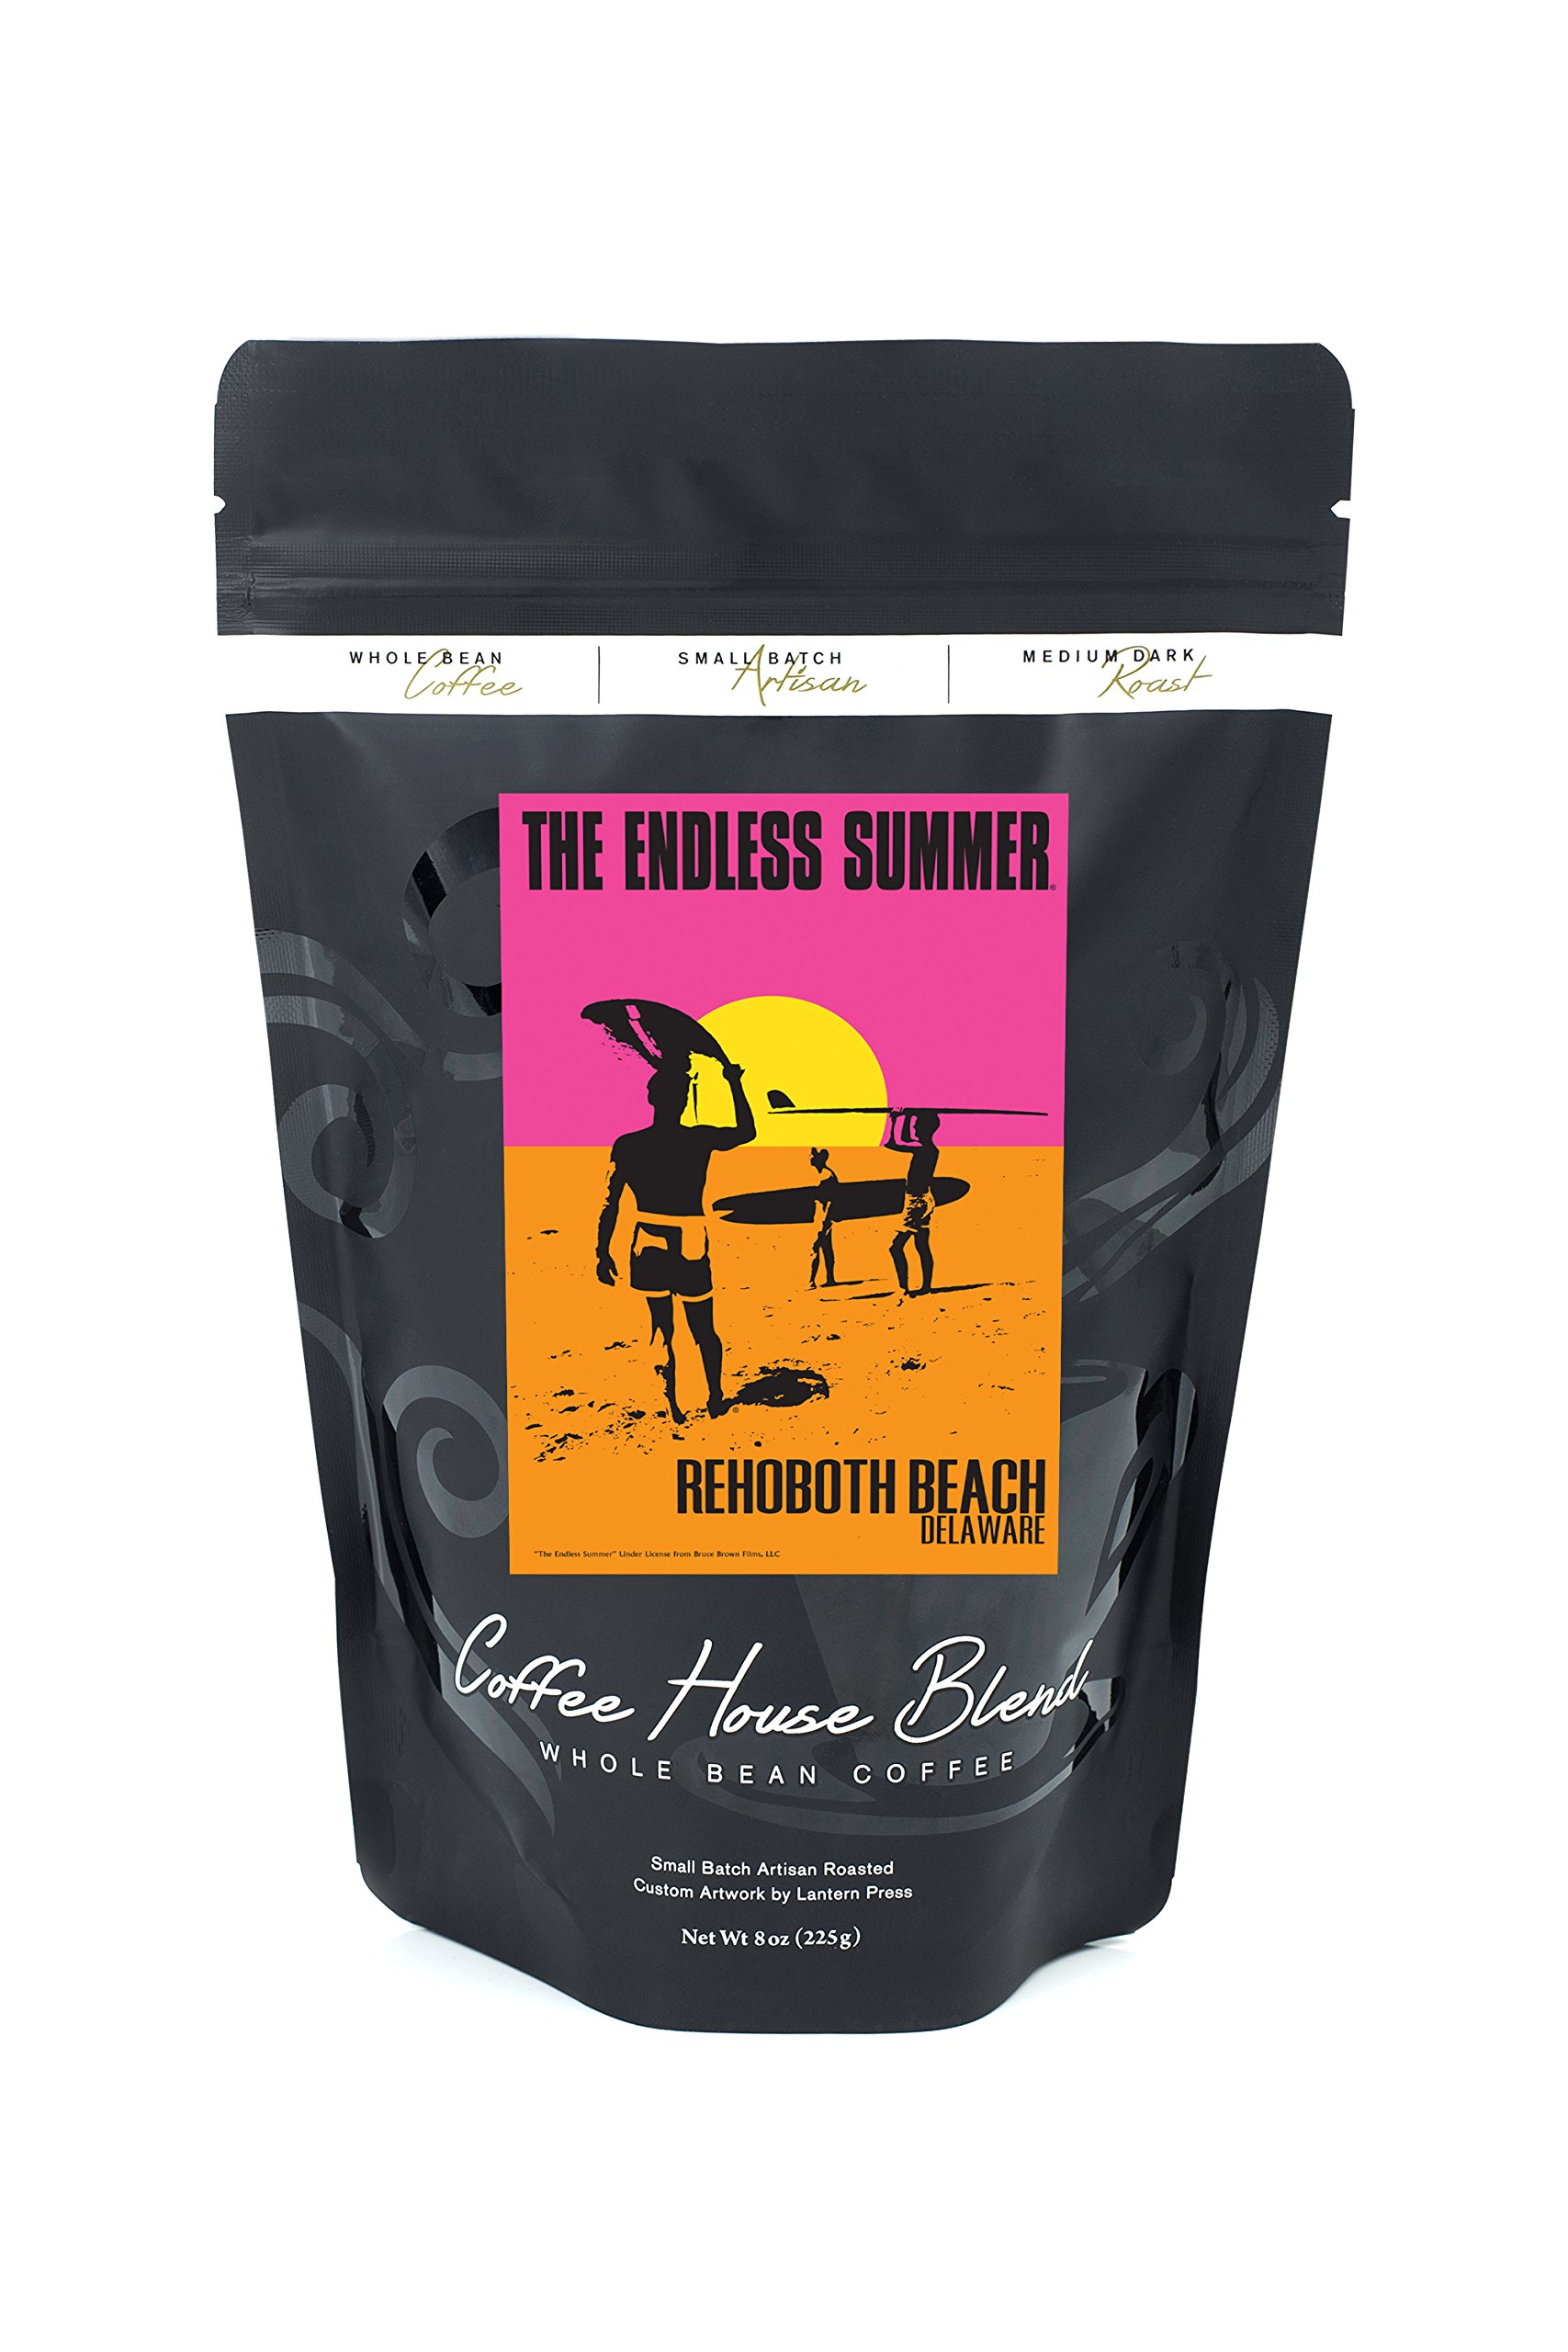 Rehoboth Beach, Delaware - The Endless Summer - Original Movie Poster (8oz Whole Bean Small Batch Artisan Coffee - Bold & Strong Medium Dark Roast w/ Artwork)